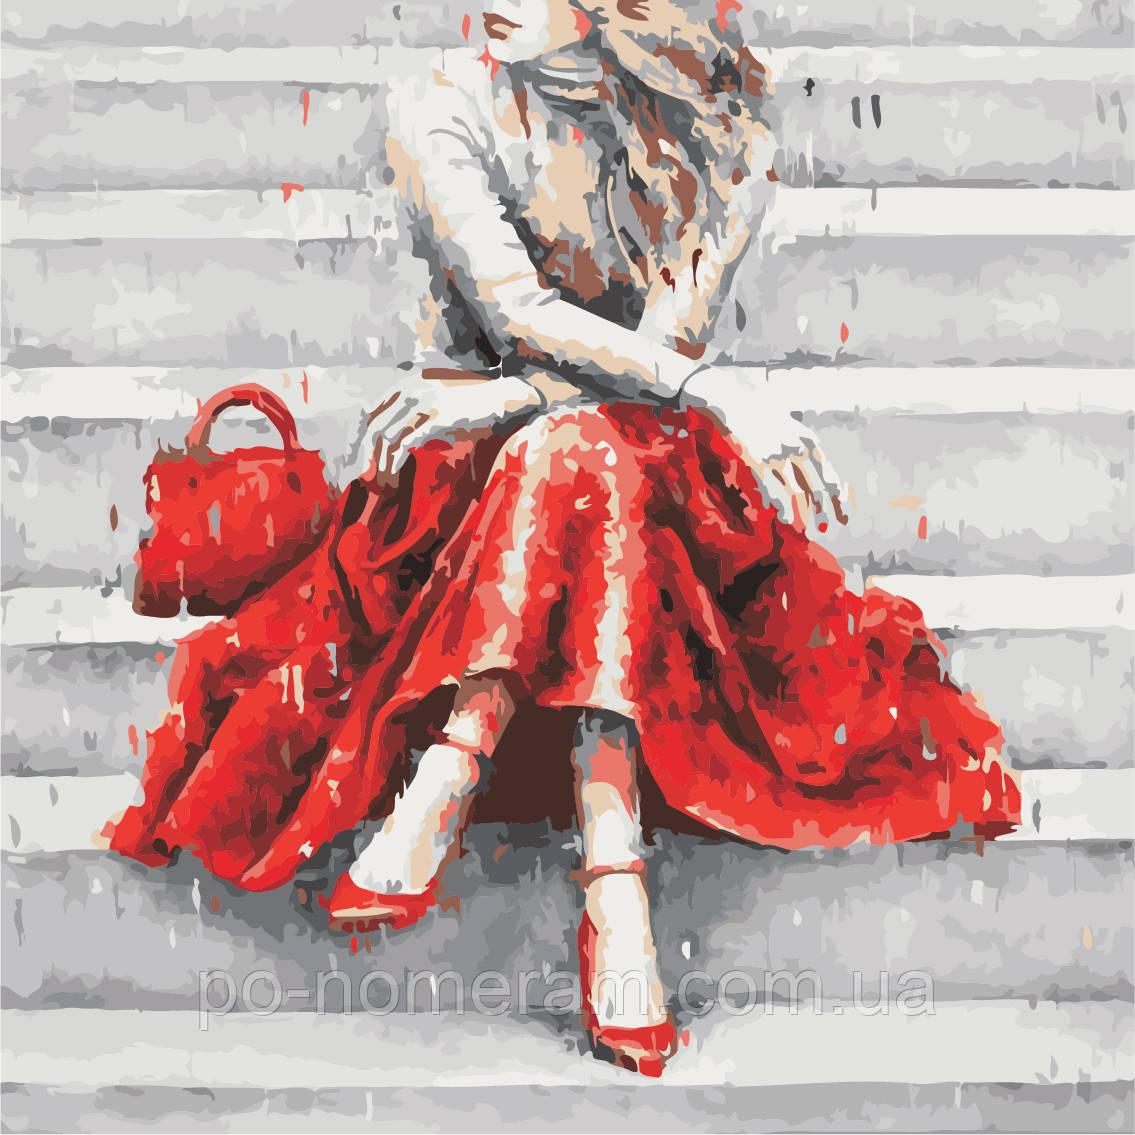 Картина по номерам ArtStory Девушка в красном (AS0937) 40 х 40 см (Без коробки)